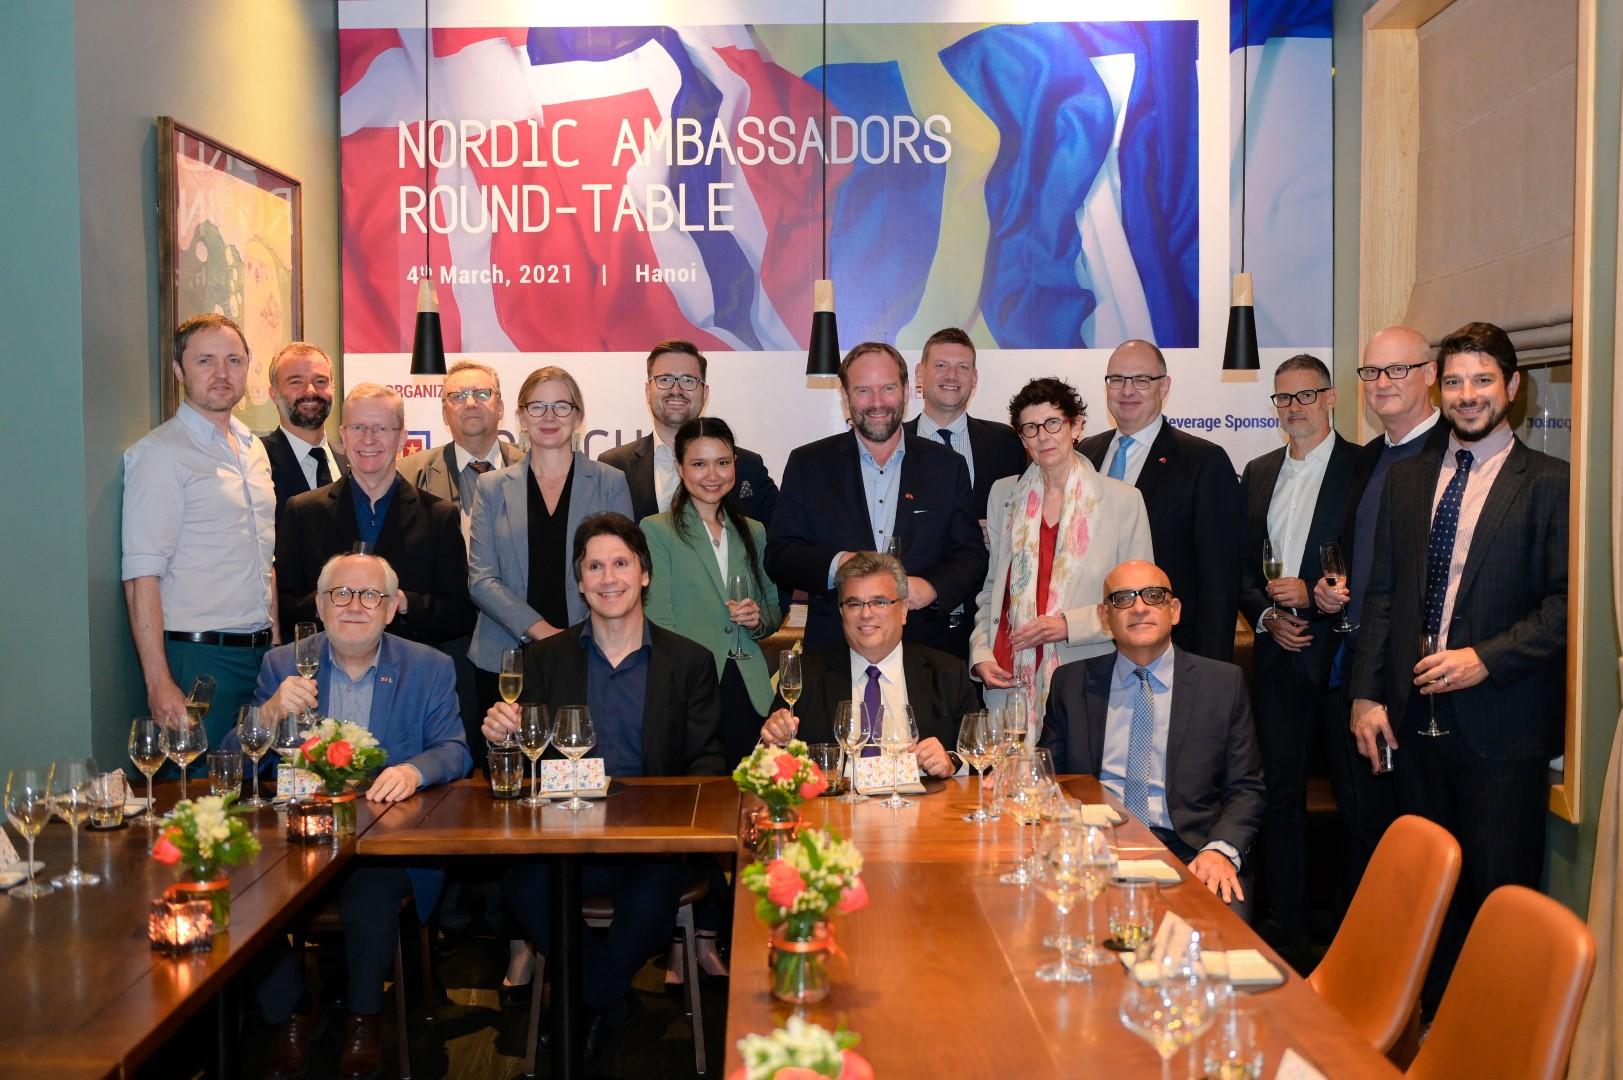 Nordic Ambassador Round-table 2021